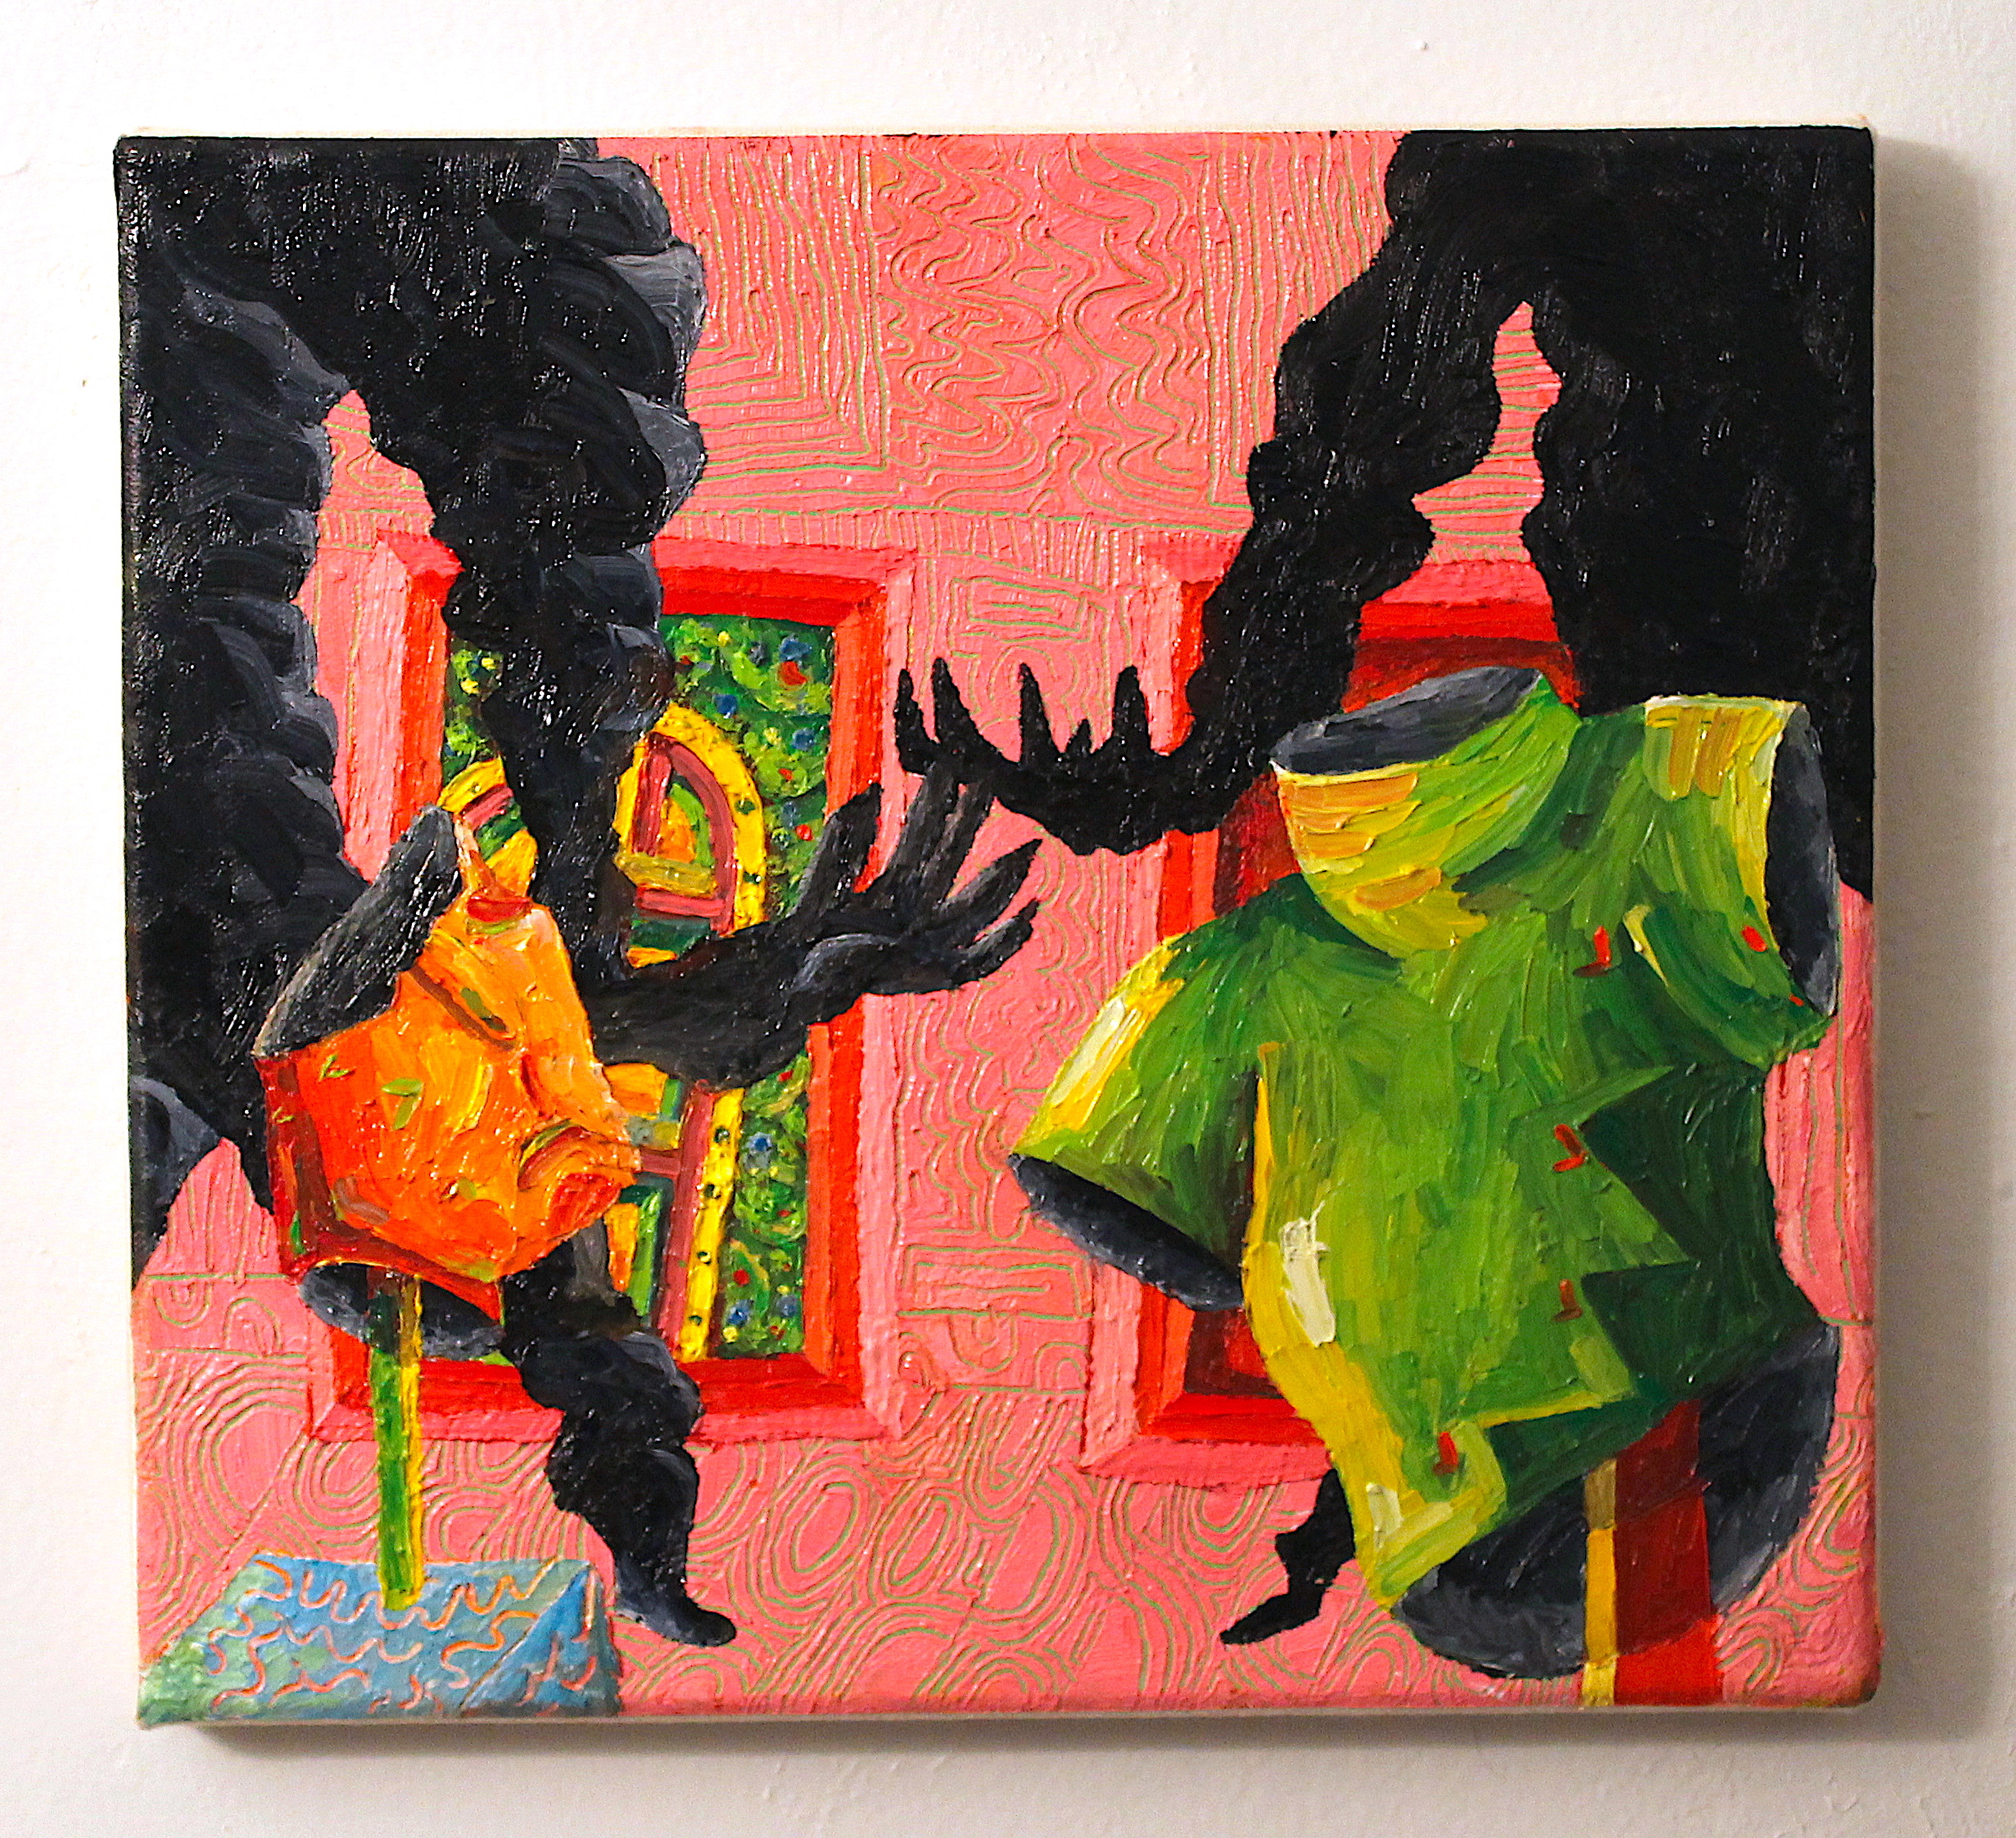 Vincent_Stracquadanio_Interior(Fragments).JPG